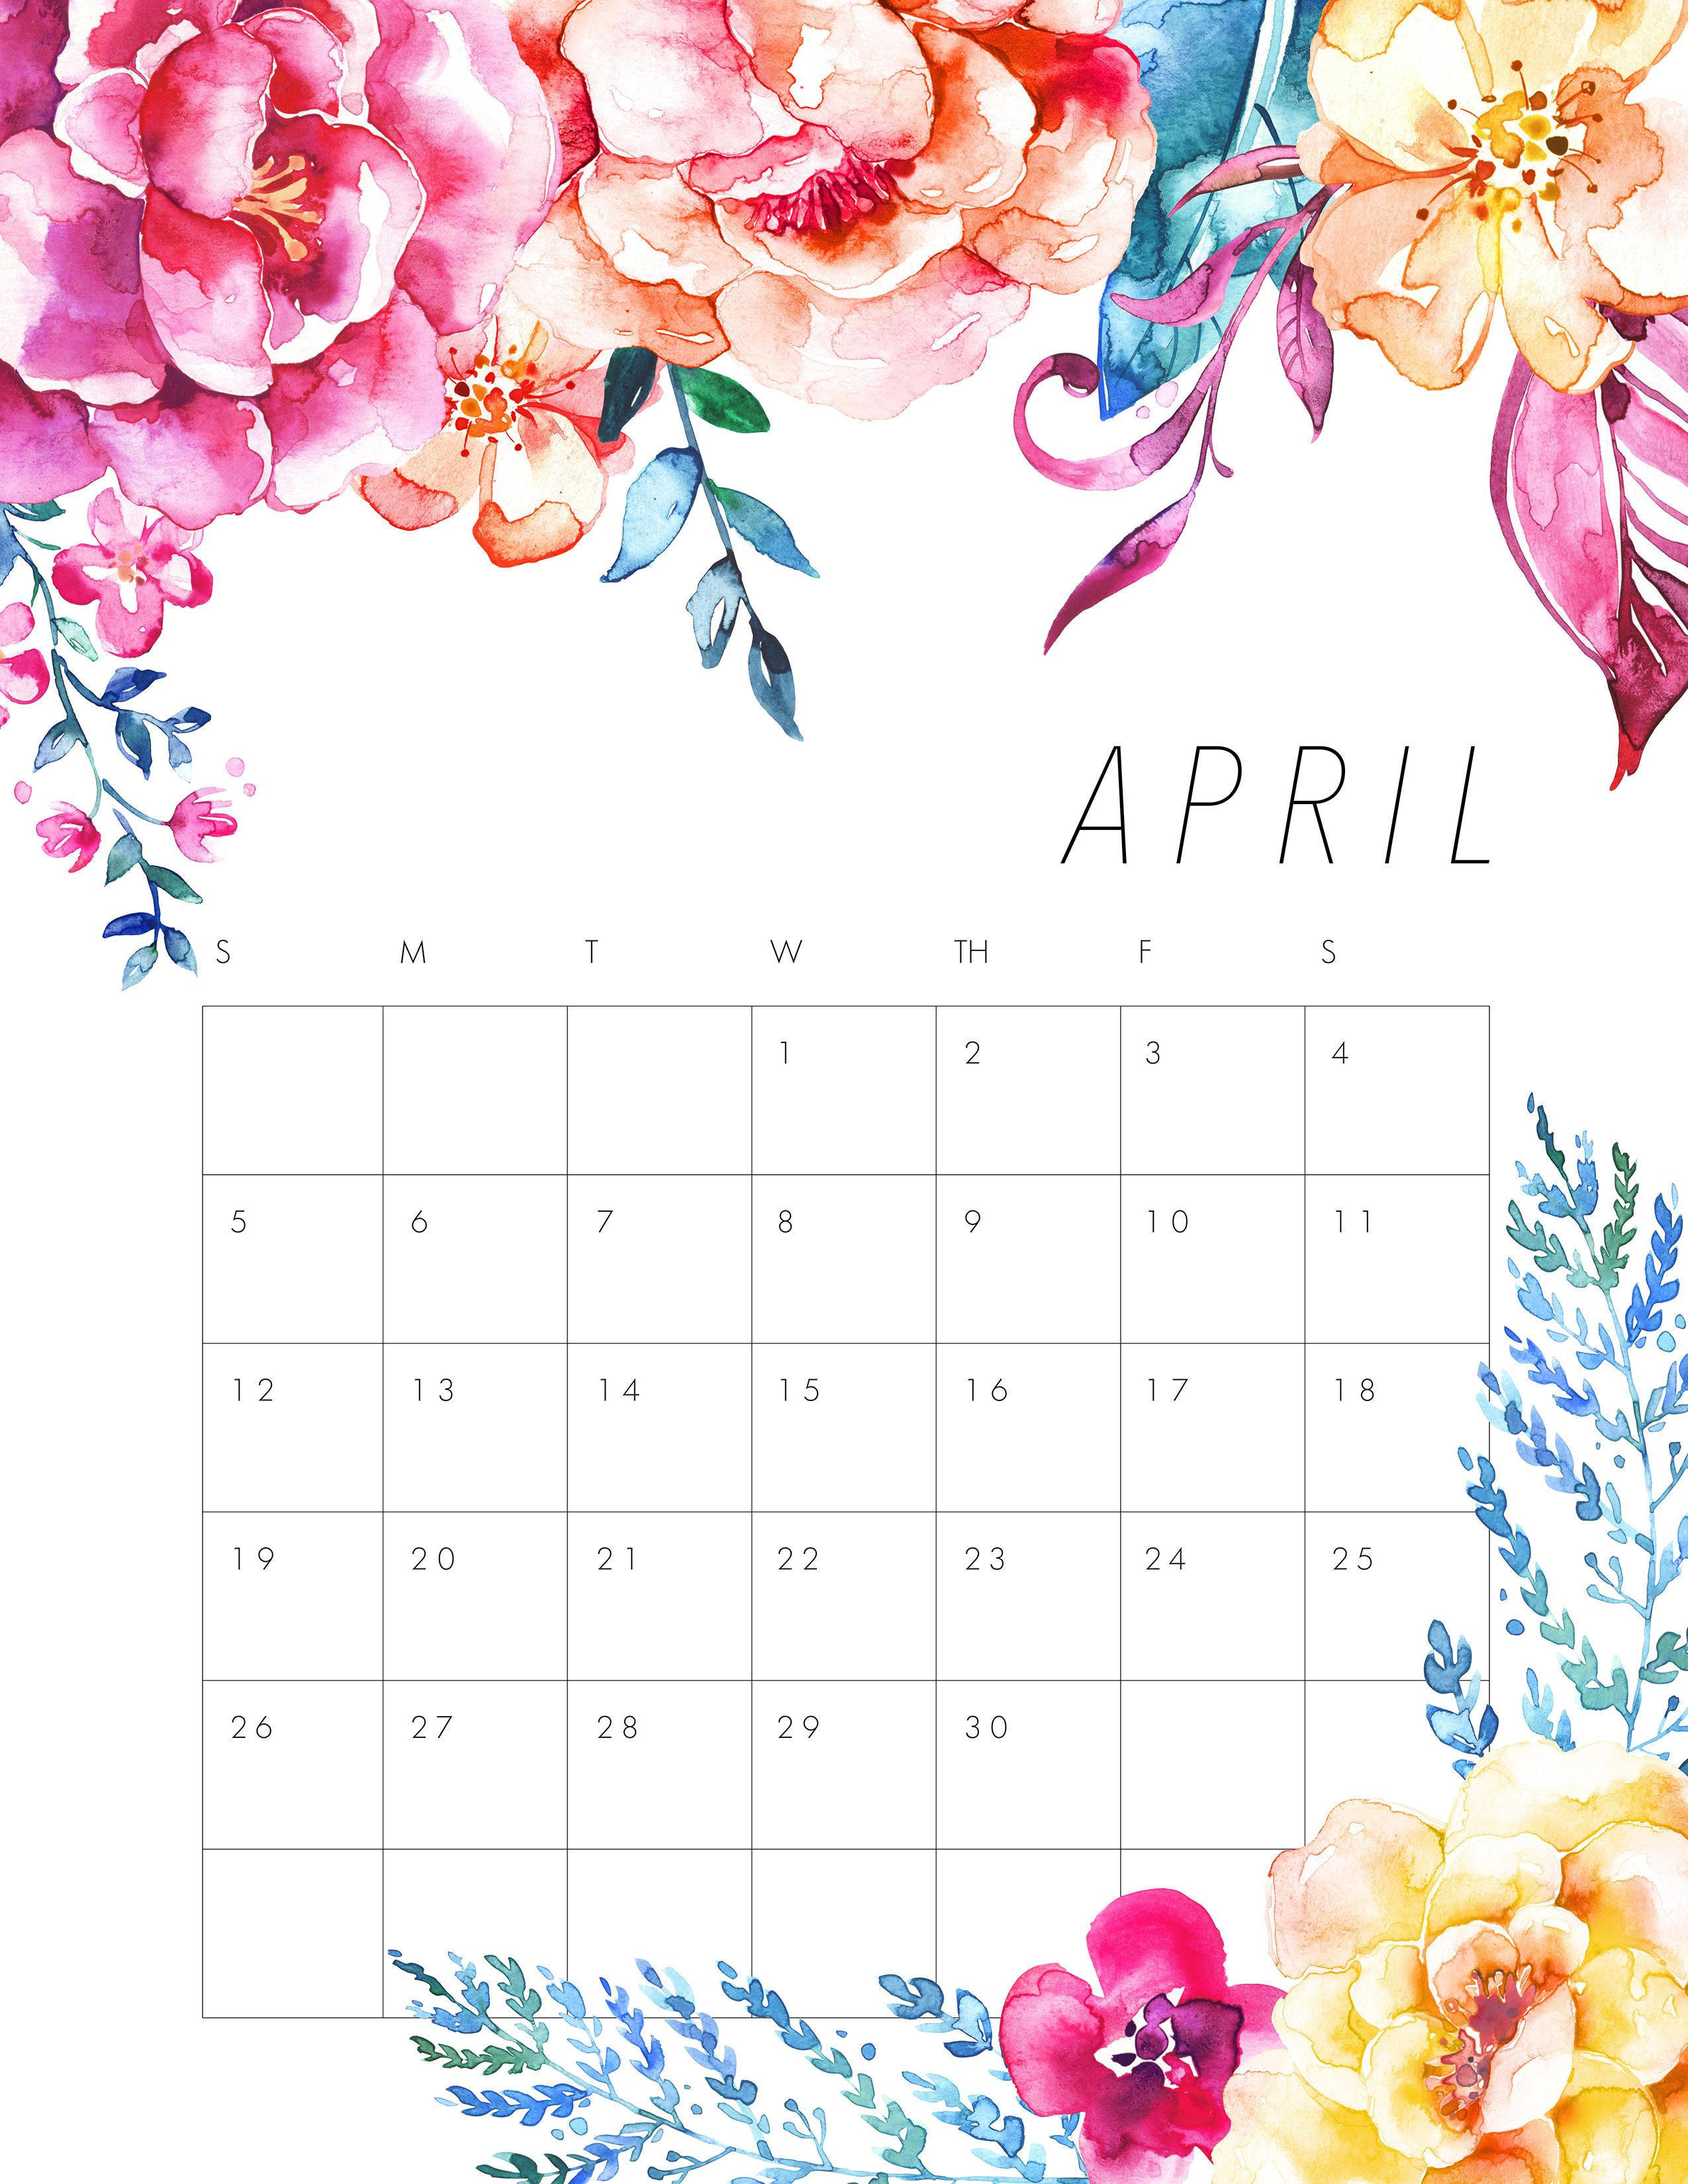 April 2020 Floral Calendar Cute